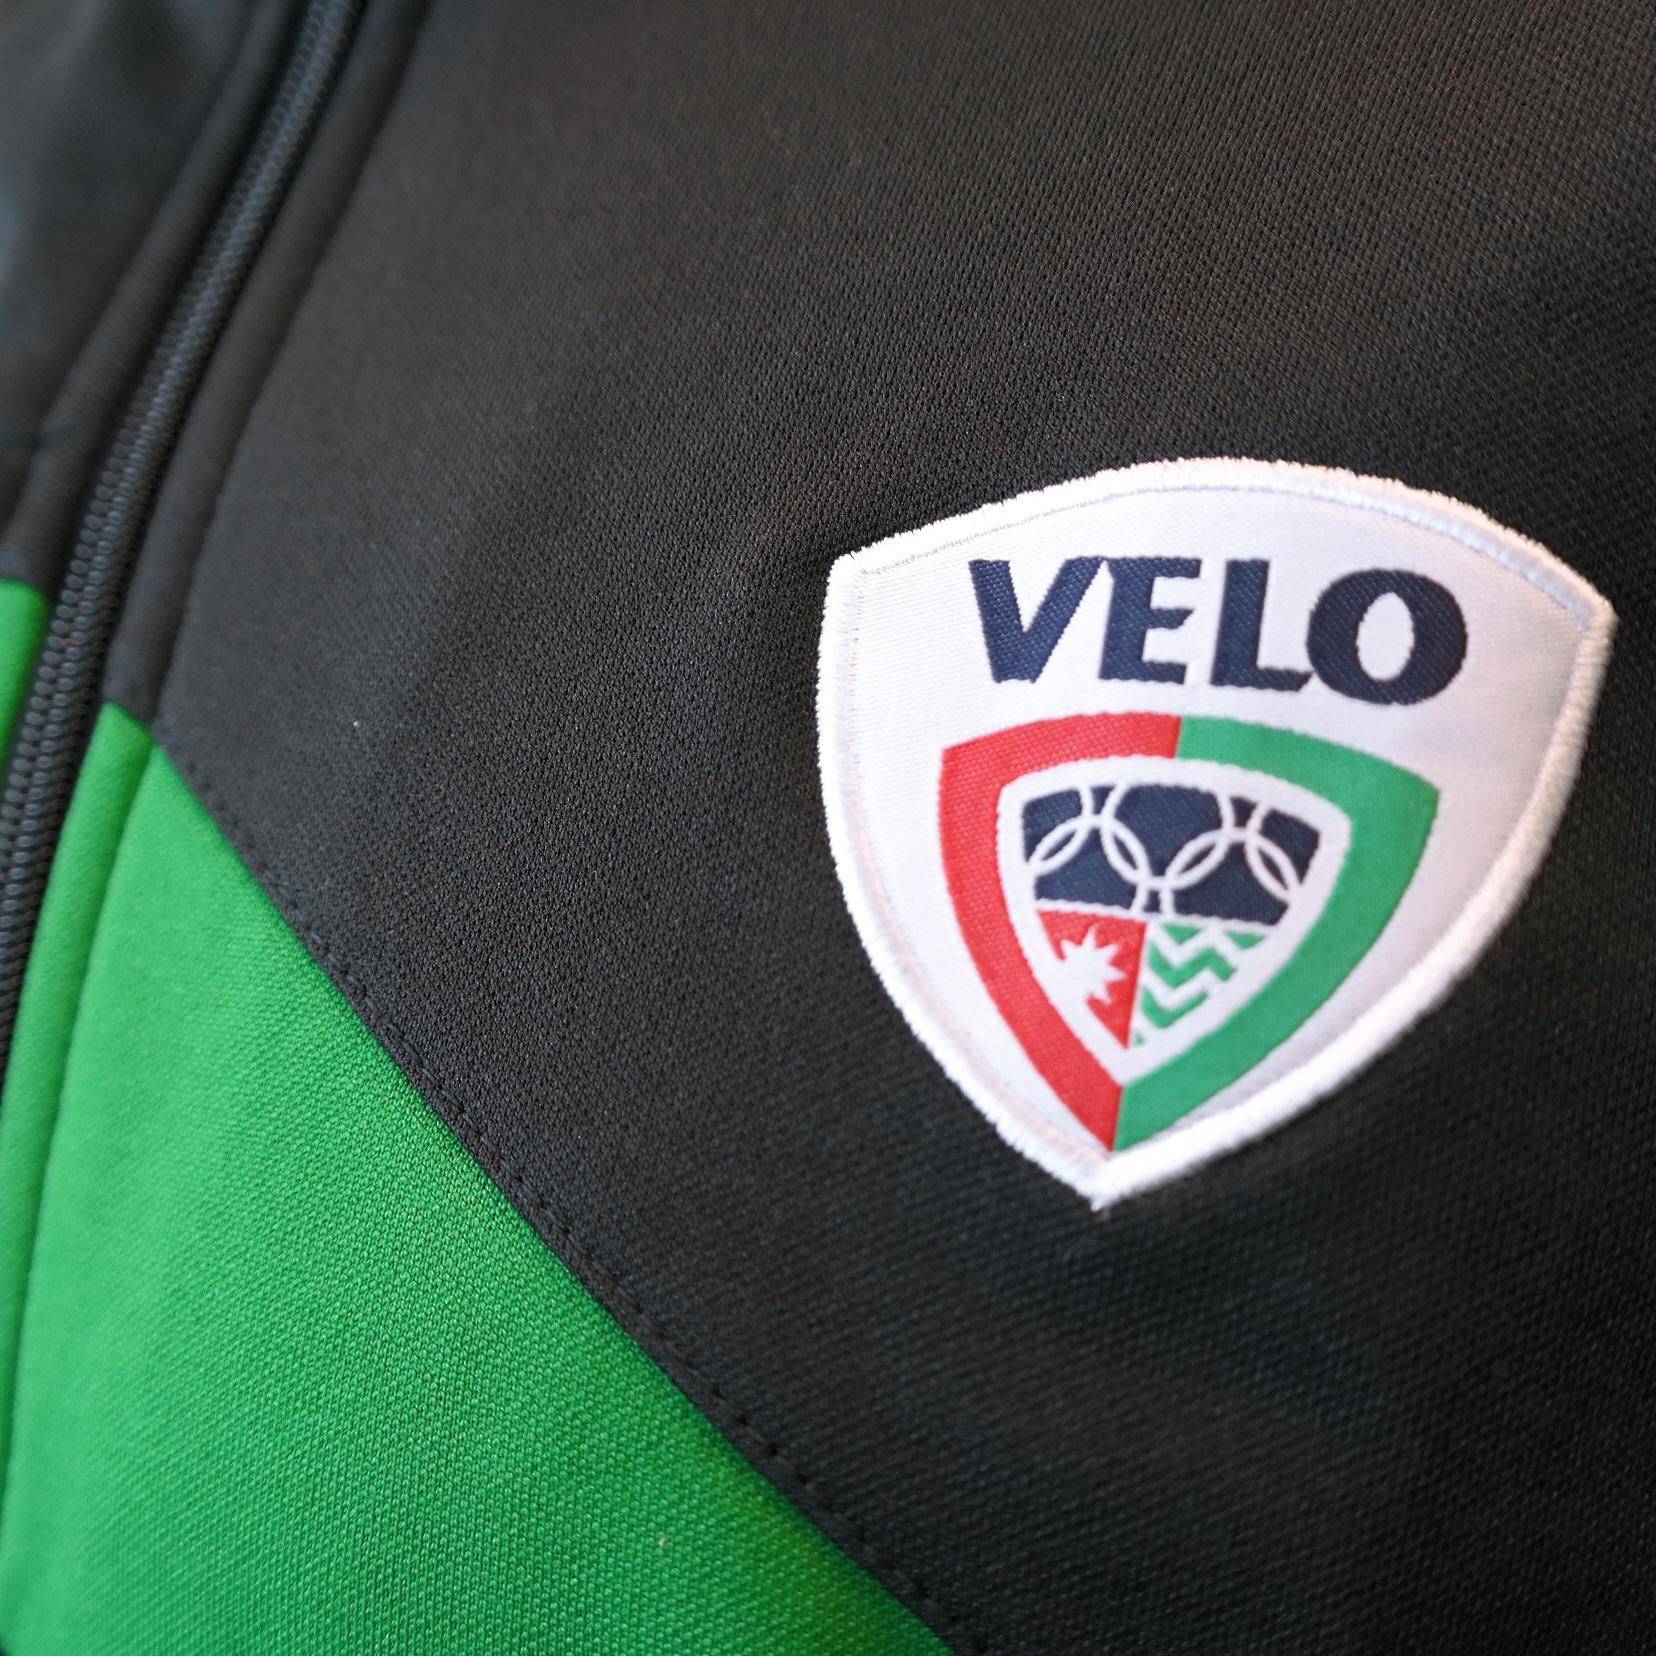 Klupp MAAT Velo Jack Jeugd, Zwart/Groen